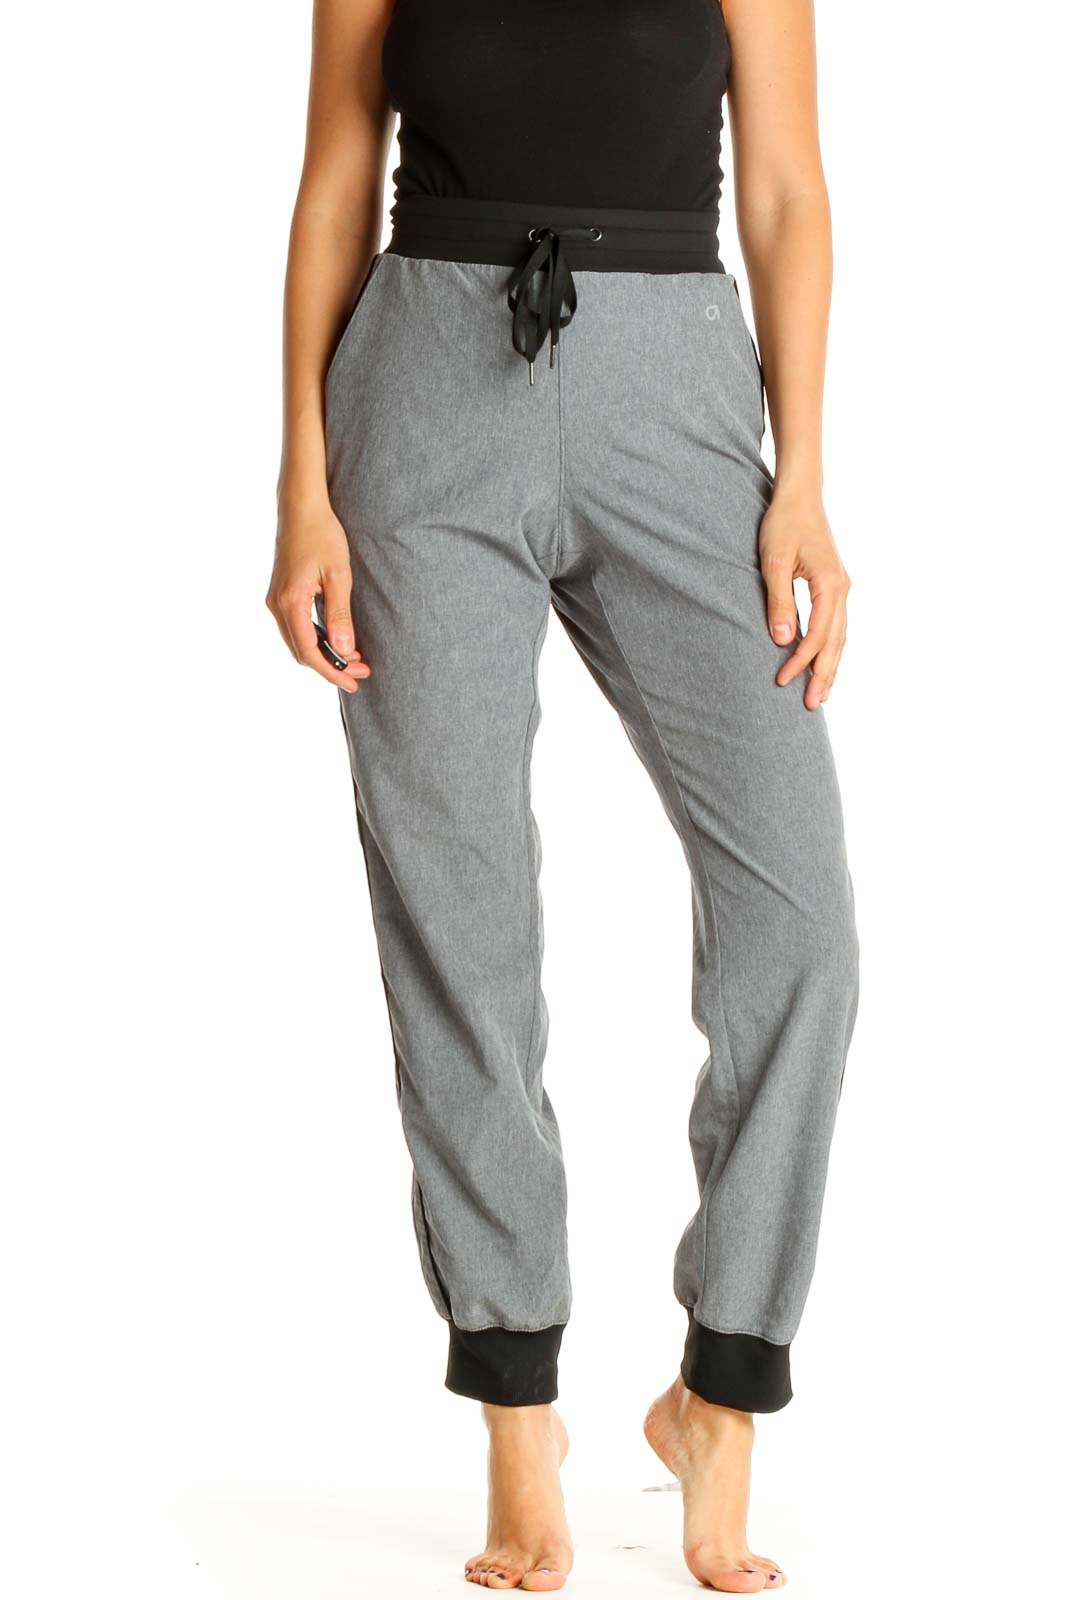 Gray Activewear Sweatpants Front